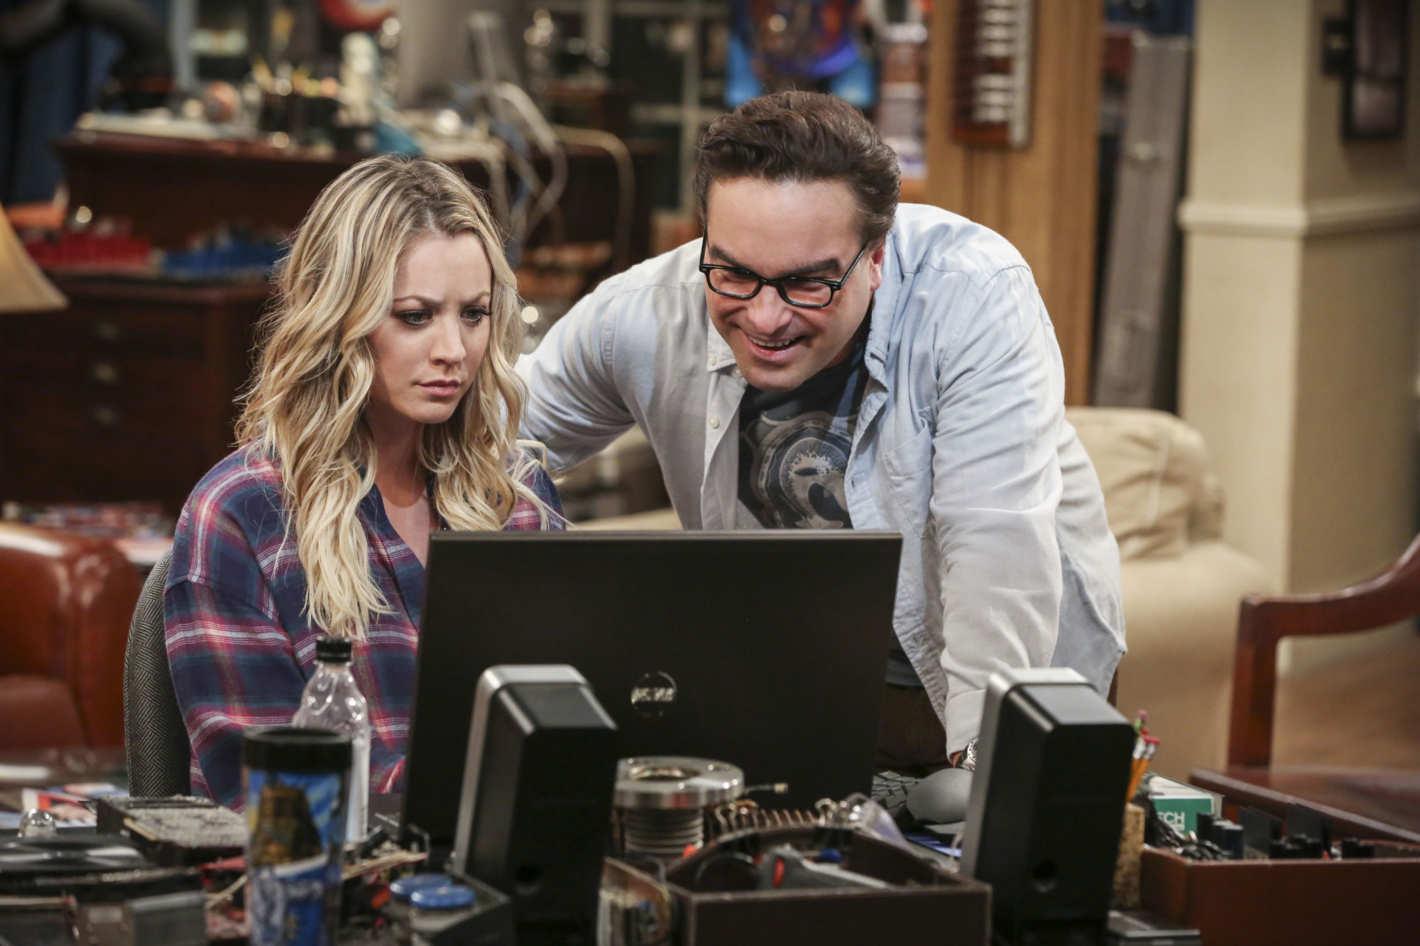 Funny big bang theory pictures 27 pics - Funny Big Bang Theory Pictures 27 Pics 23